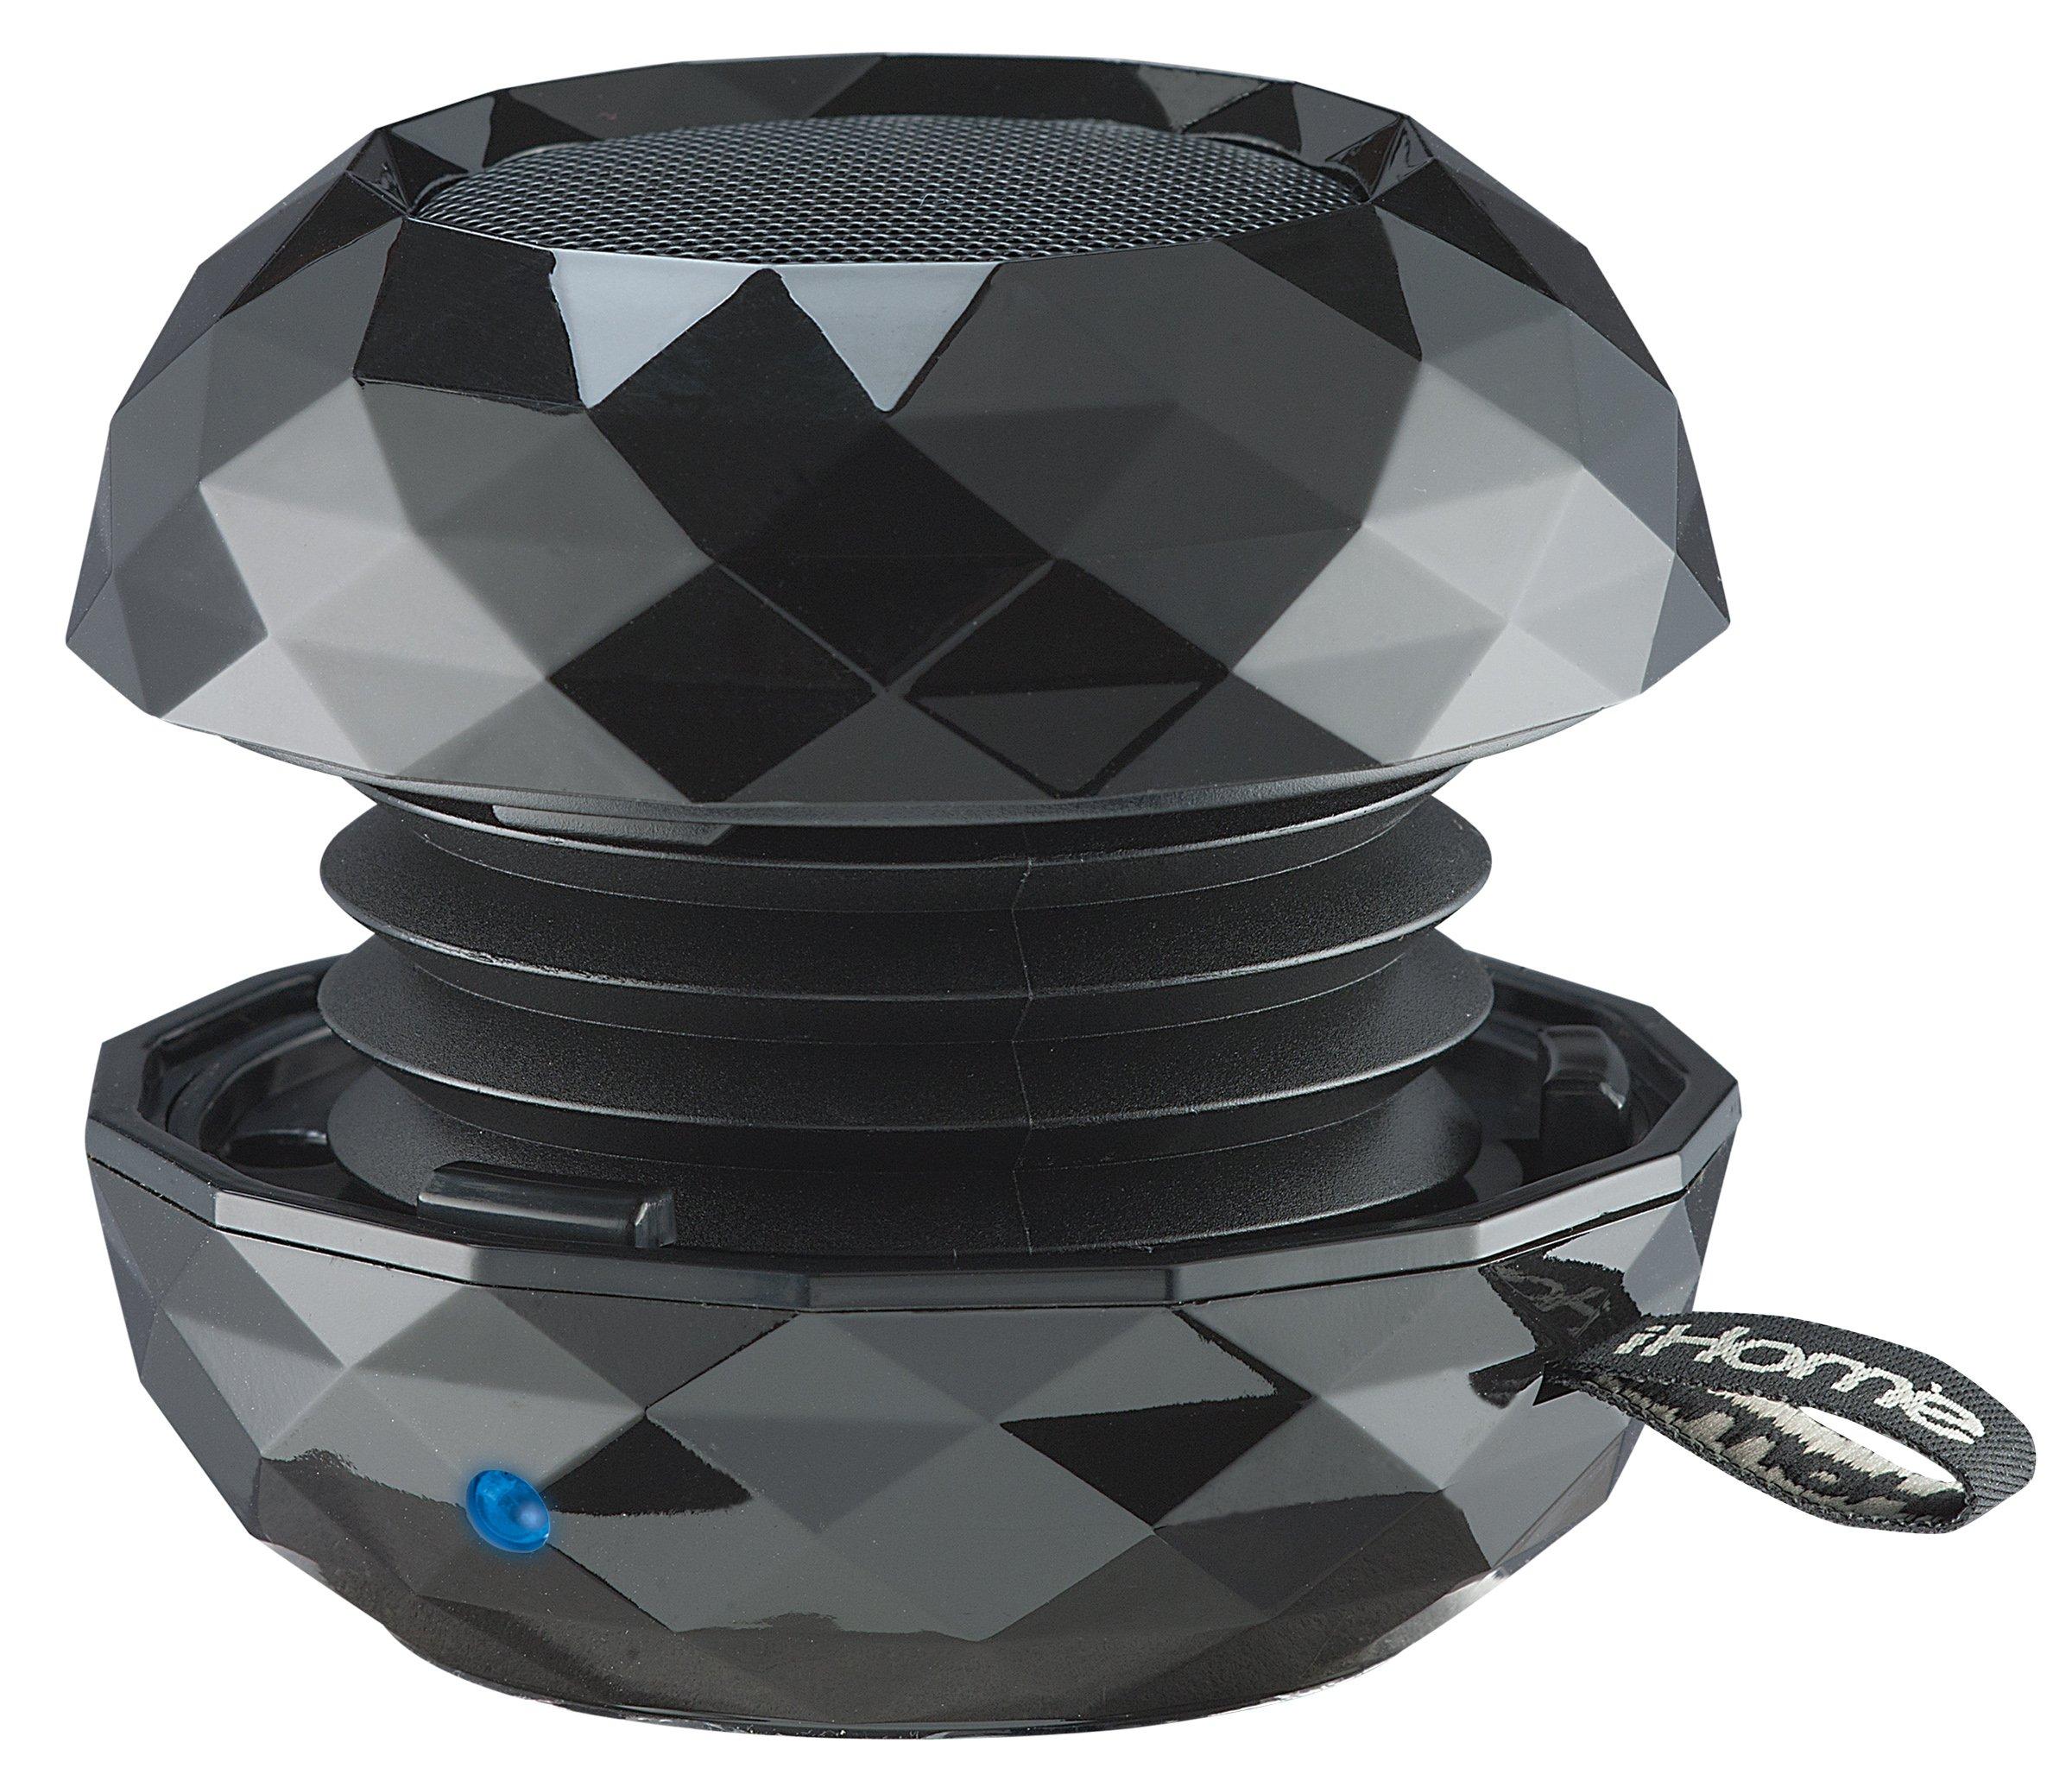 iHome IBT65B Bluetooth Rechargeable Mini Speaker System in Metallic Finish (Black)